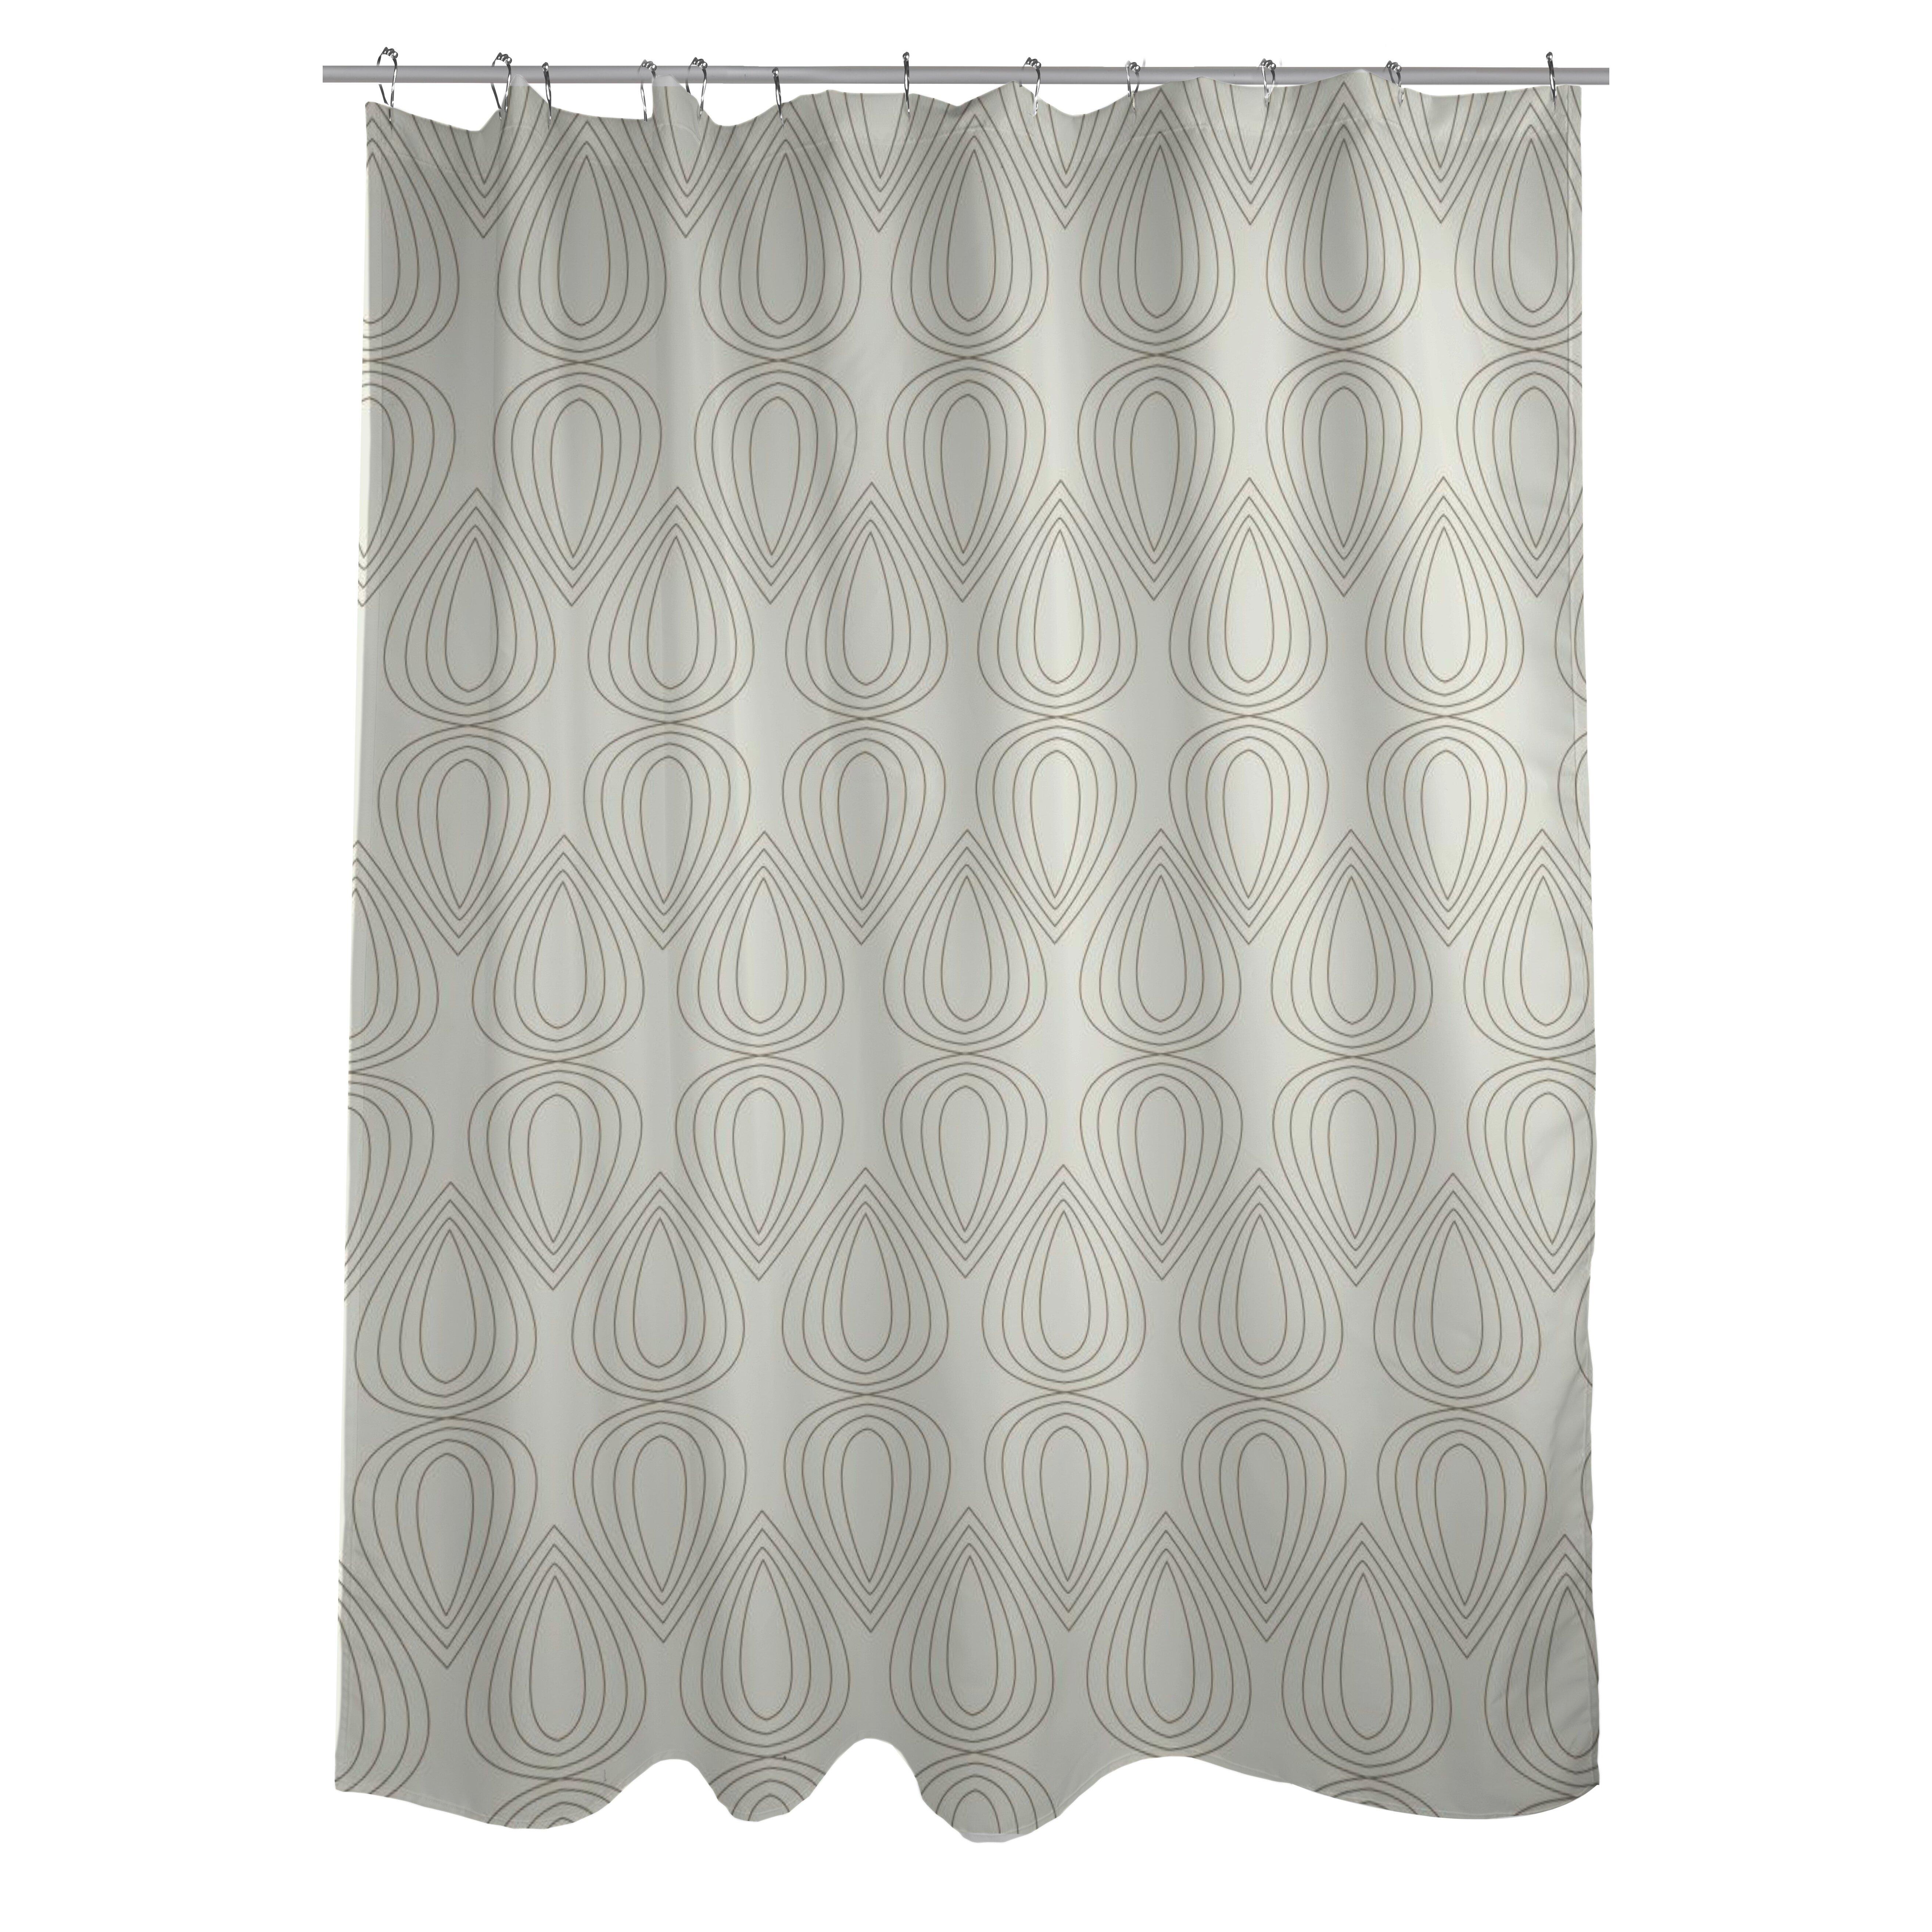 One Bella Casa Mod Drops Geometric Shower Curtain Reviews Wayfair